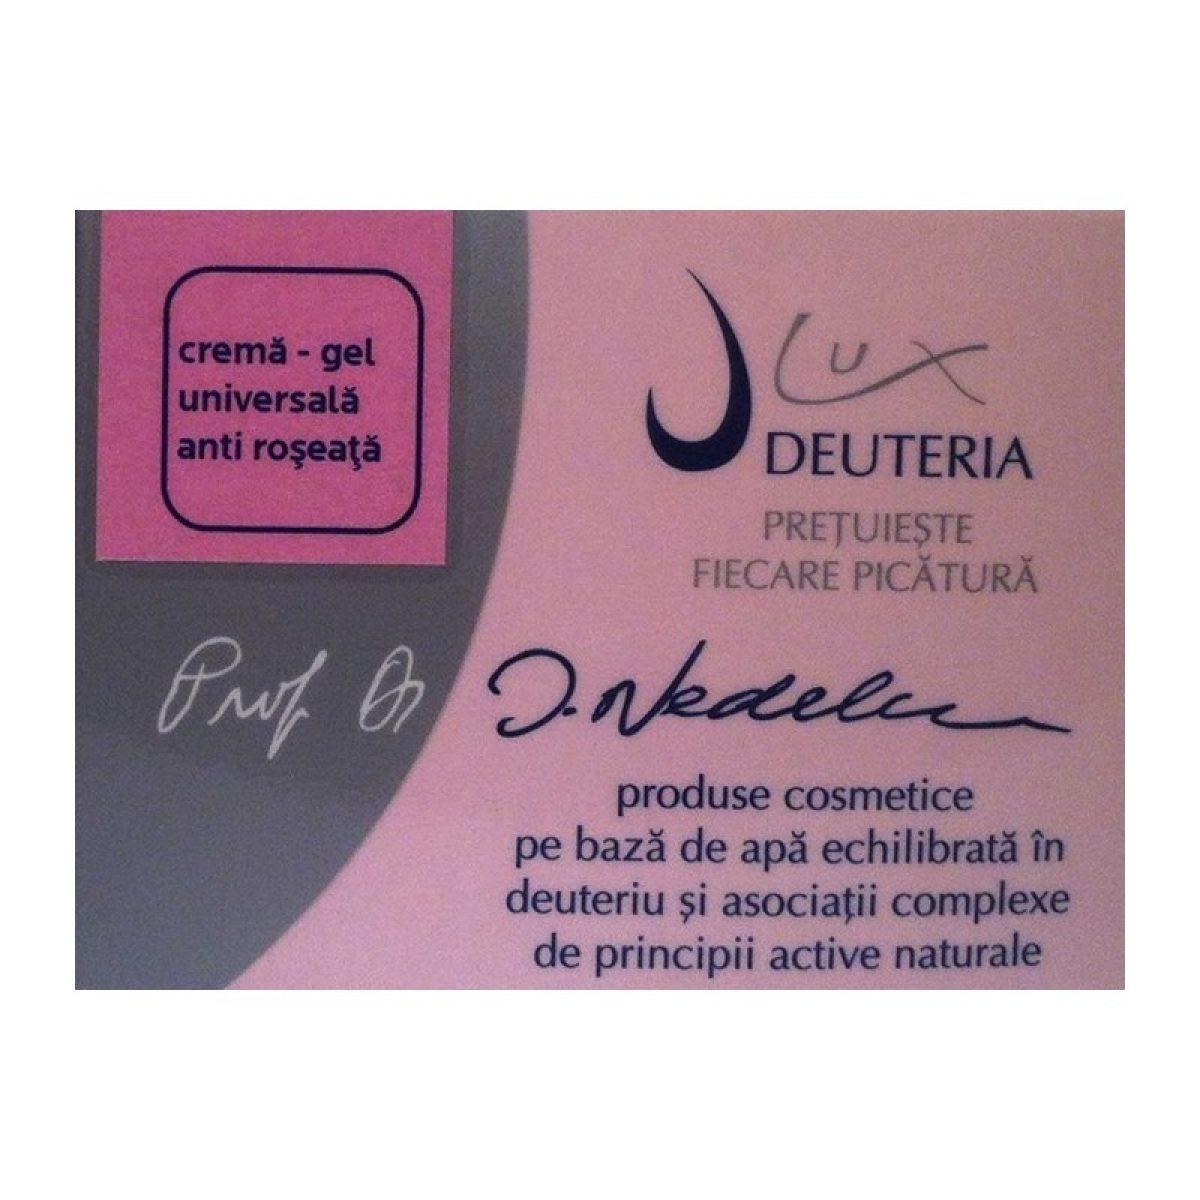 Crema-gel universala anti roseata